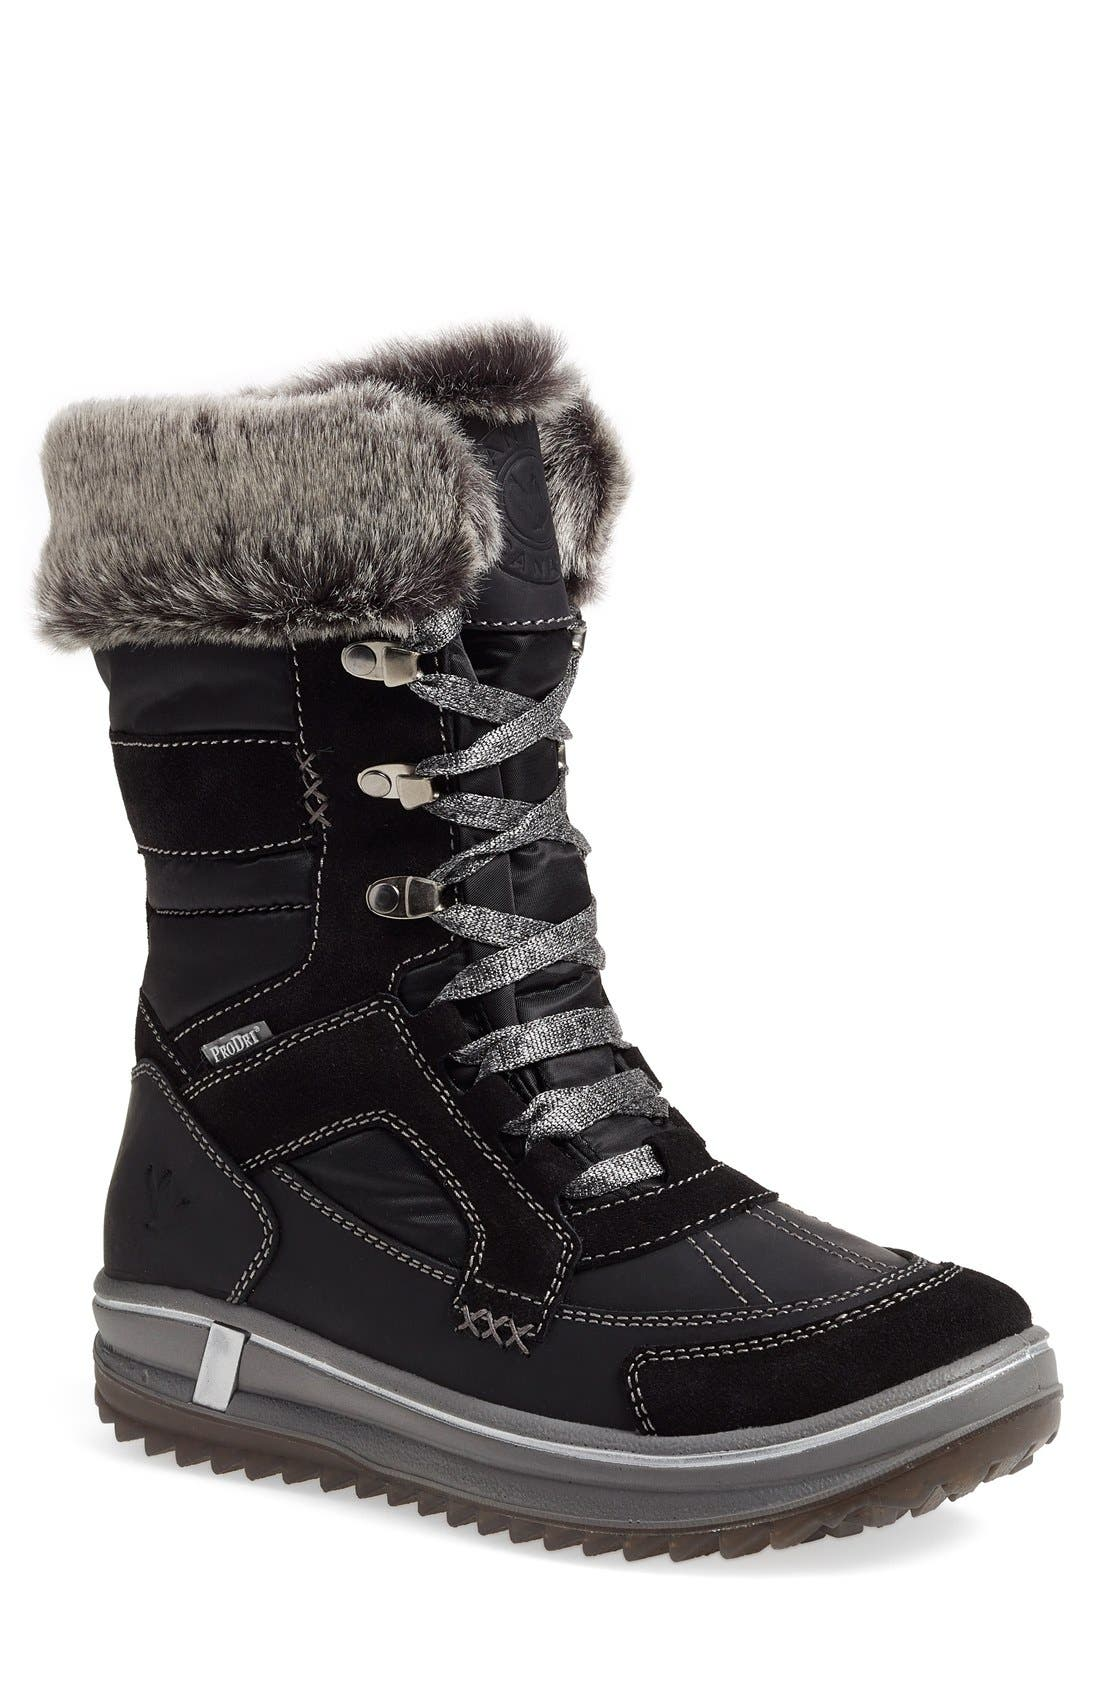 Santana Canada 'Marta' Water Resistant Insulated Winter Boot (Women)